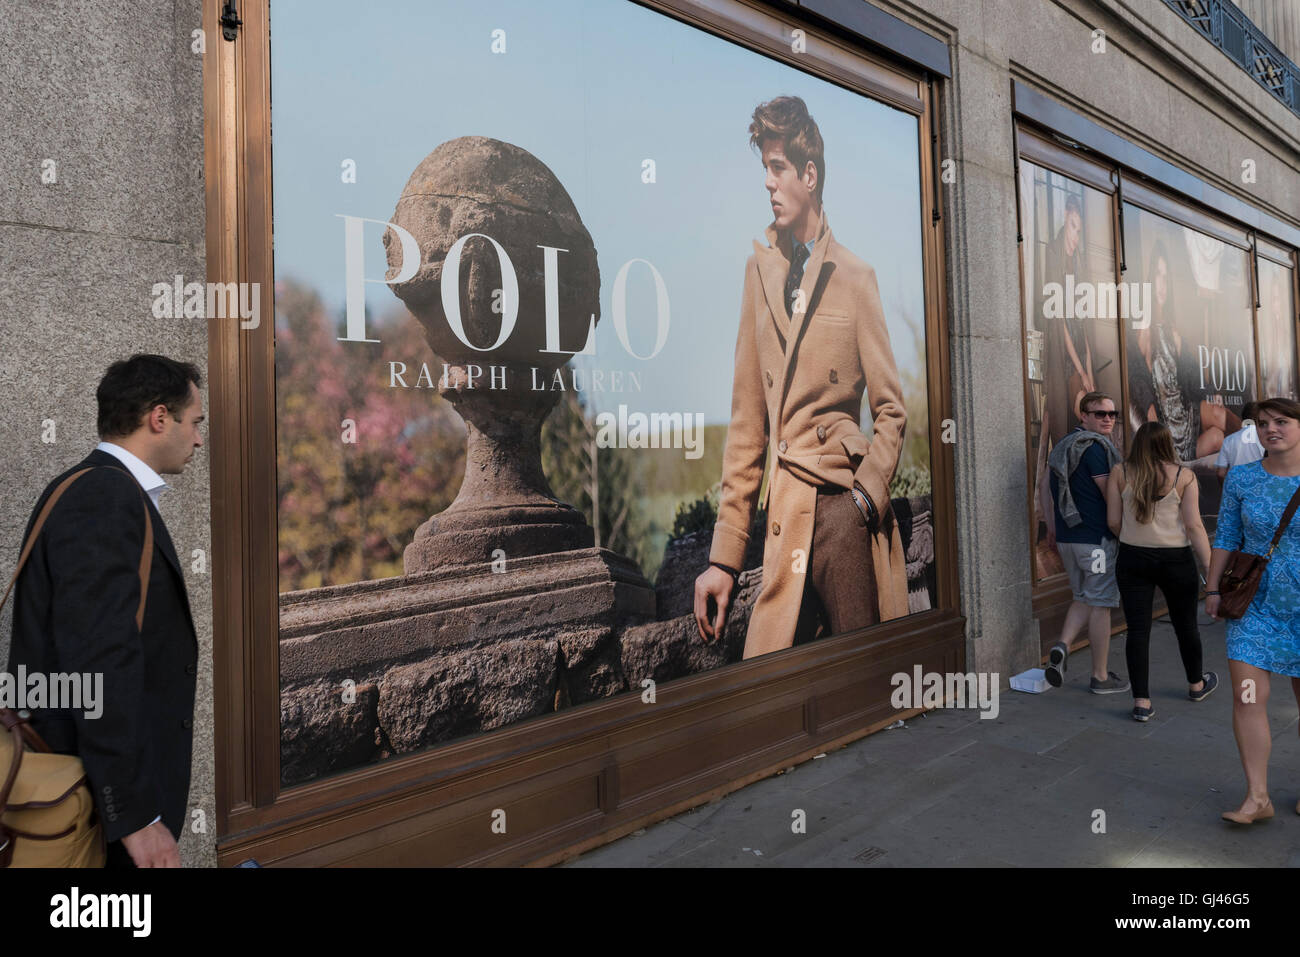 the best attitude 63d63 78797 Polo Ralph Lauren 2016 Stockfotos & Polo Ralph Lauren 2016 ...